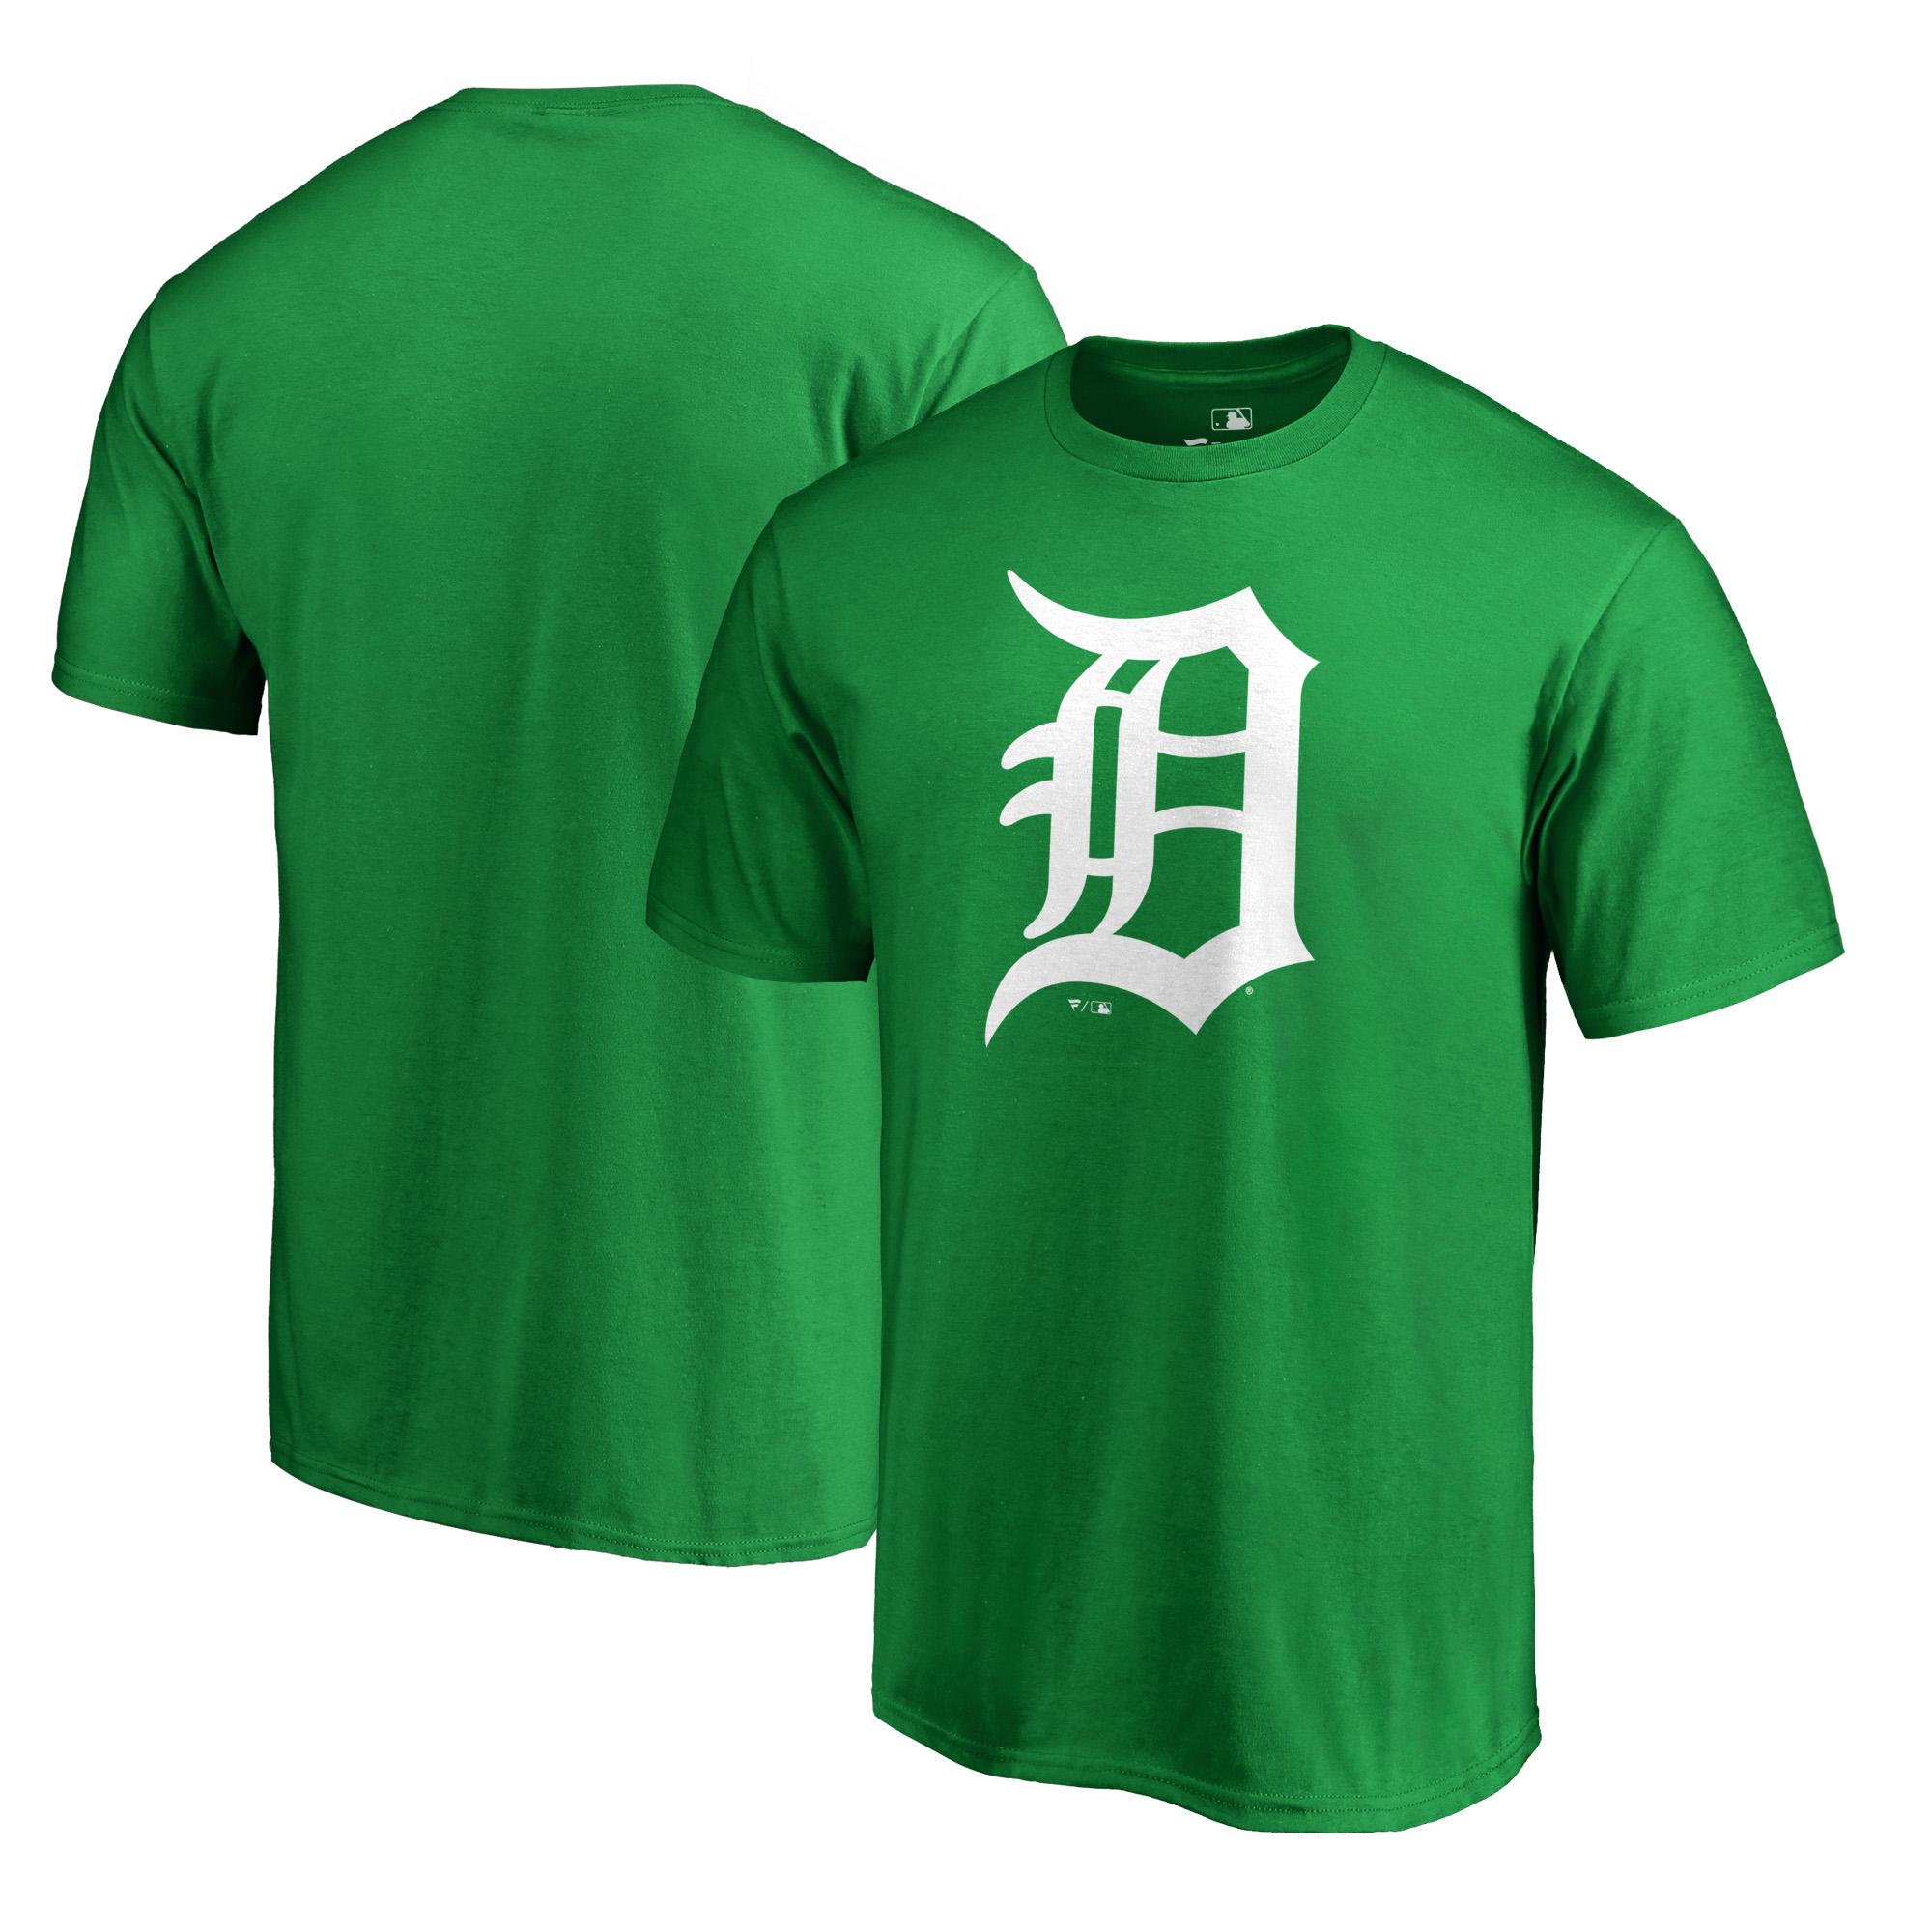 Detroit Tigers Fanatics Branded St. Patrick's Day White Logo Big & Tall T-Shirt - Green